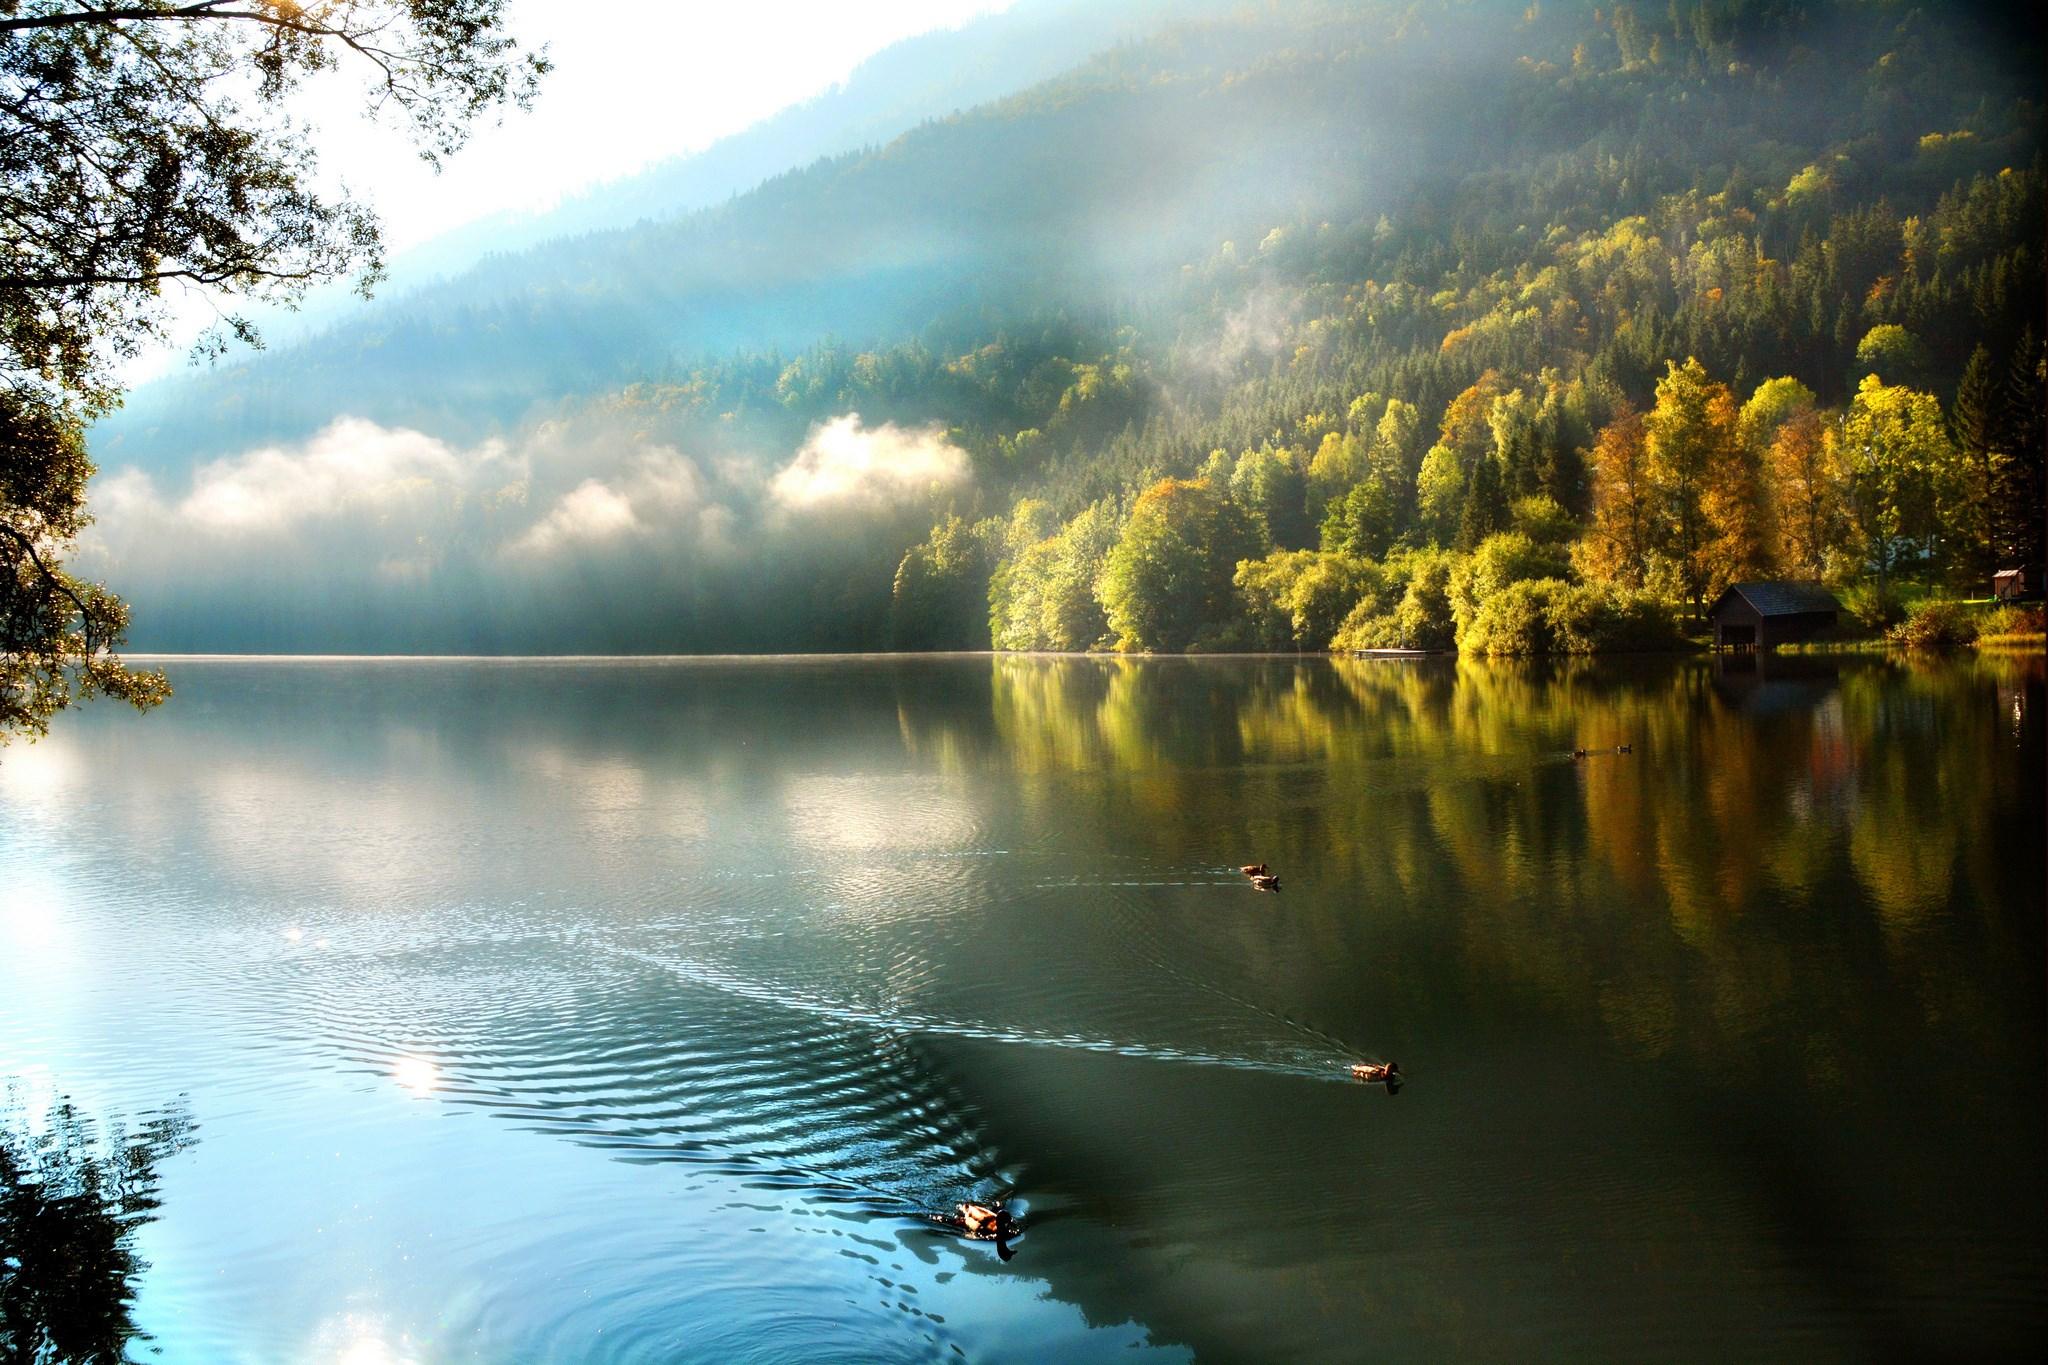 Download Wallpaper Mountain Morning - Morning-Mountain-Lake-Forest-Ducks-Wallpaper-2048x1365  Graphic_52050.jpg